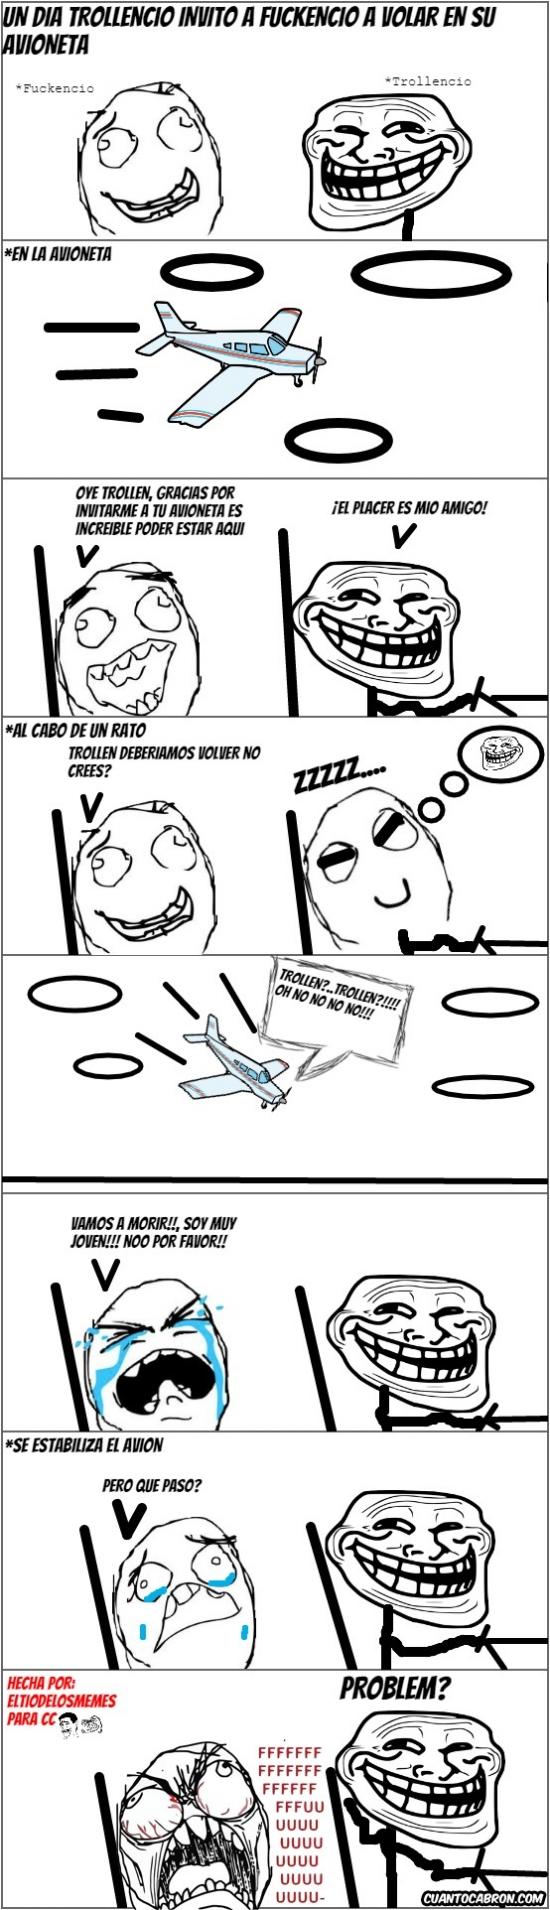 Trollface - Desde entonces no volvió a volar en avioneta